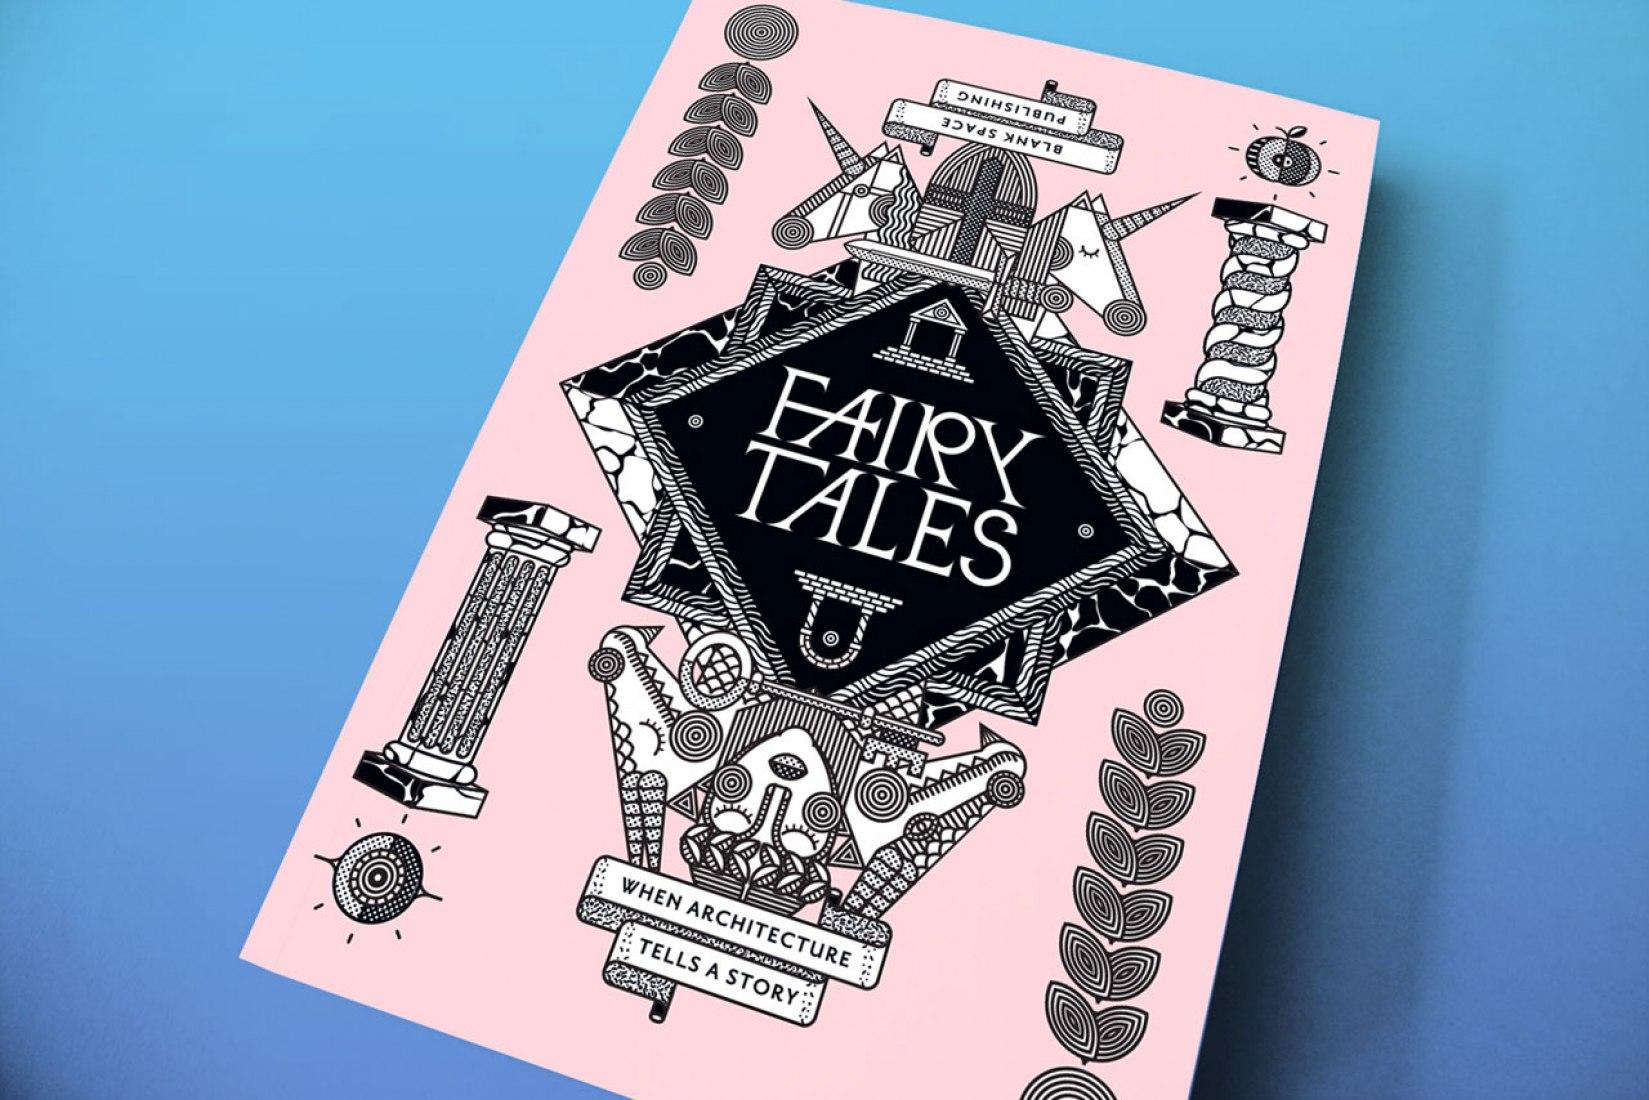 Portada. Fairy Tales: When Architecture Tells a Story. Cortesía de Blank Space